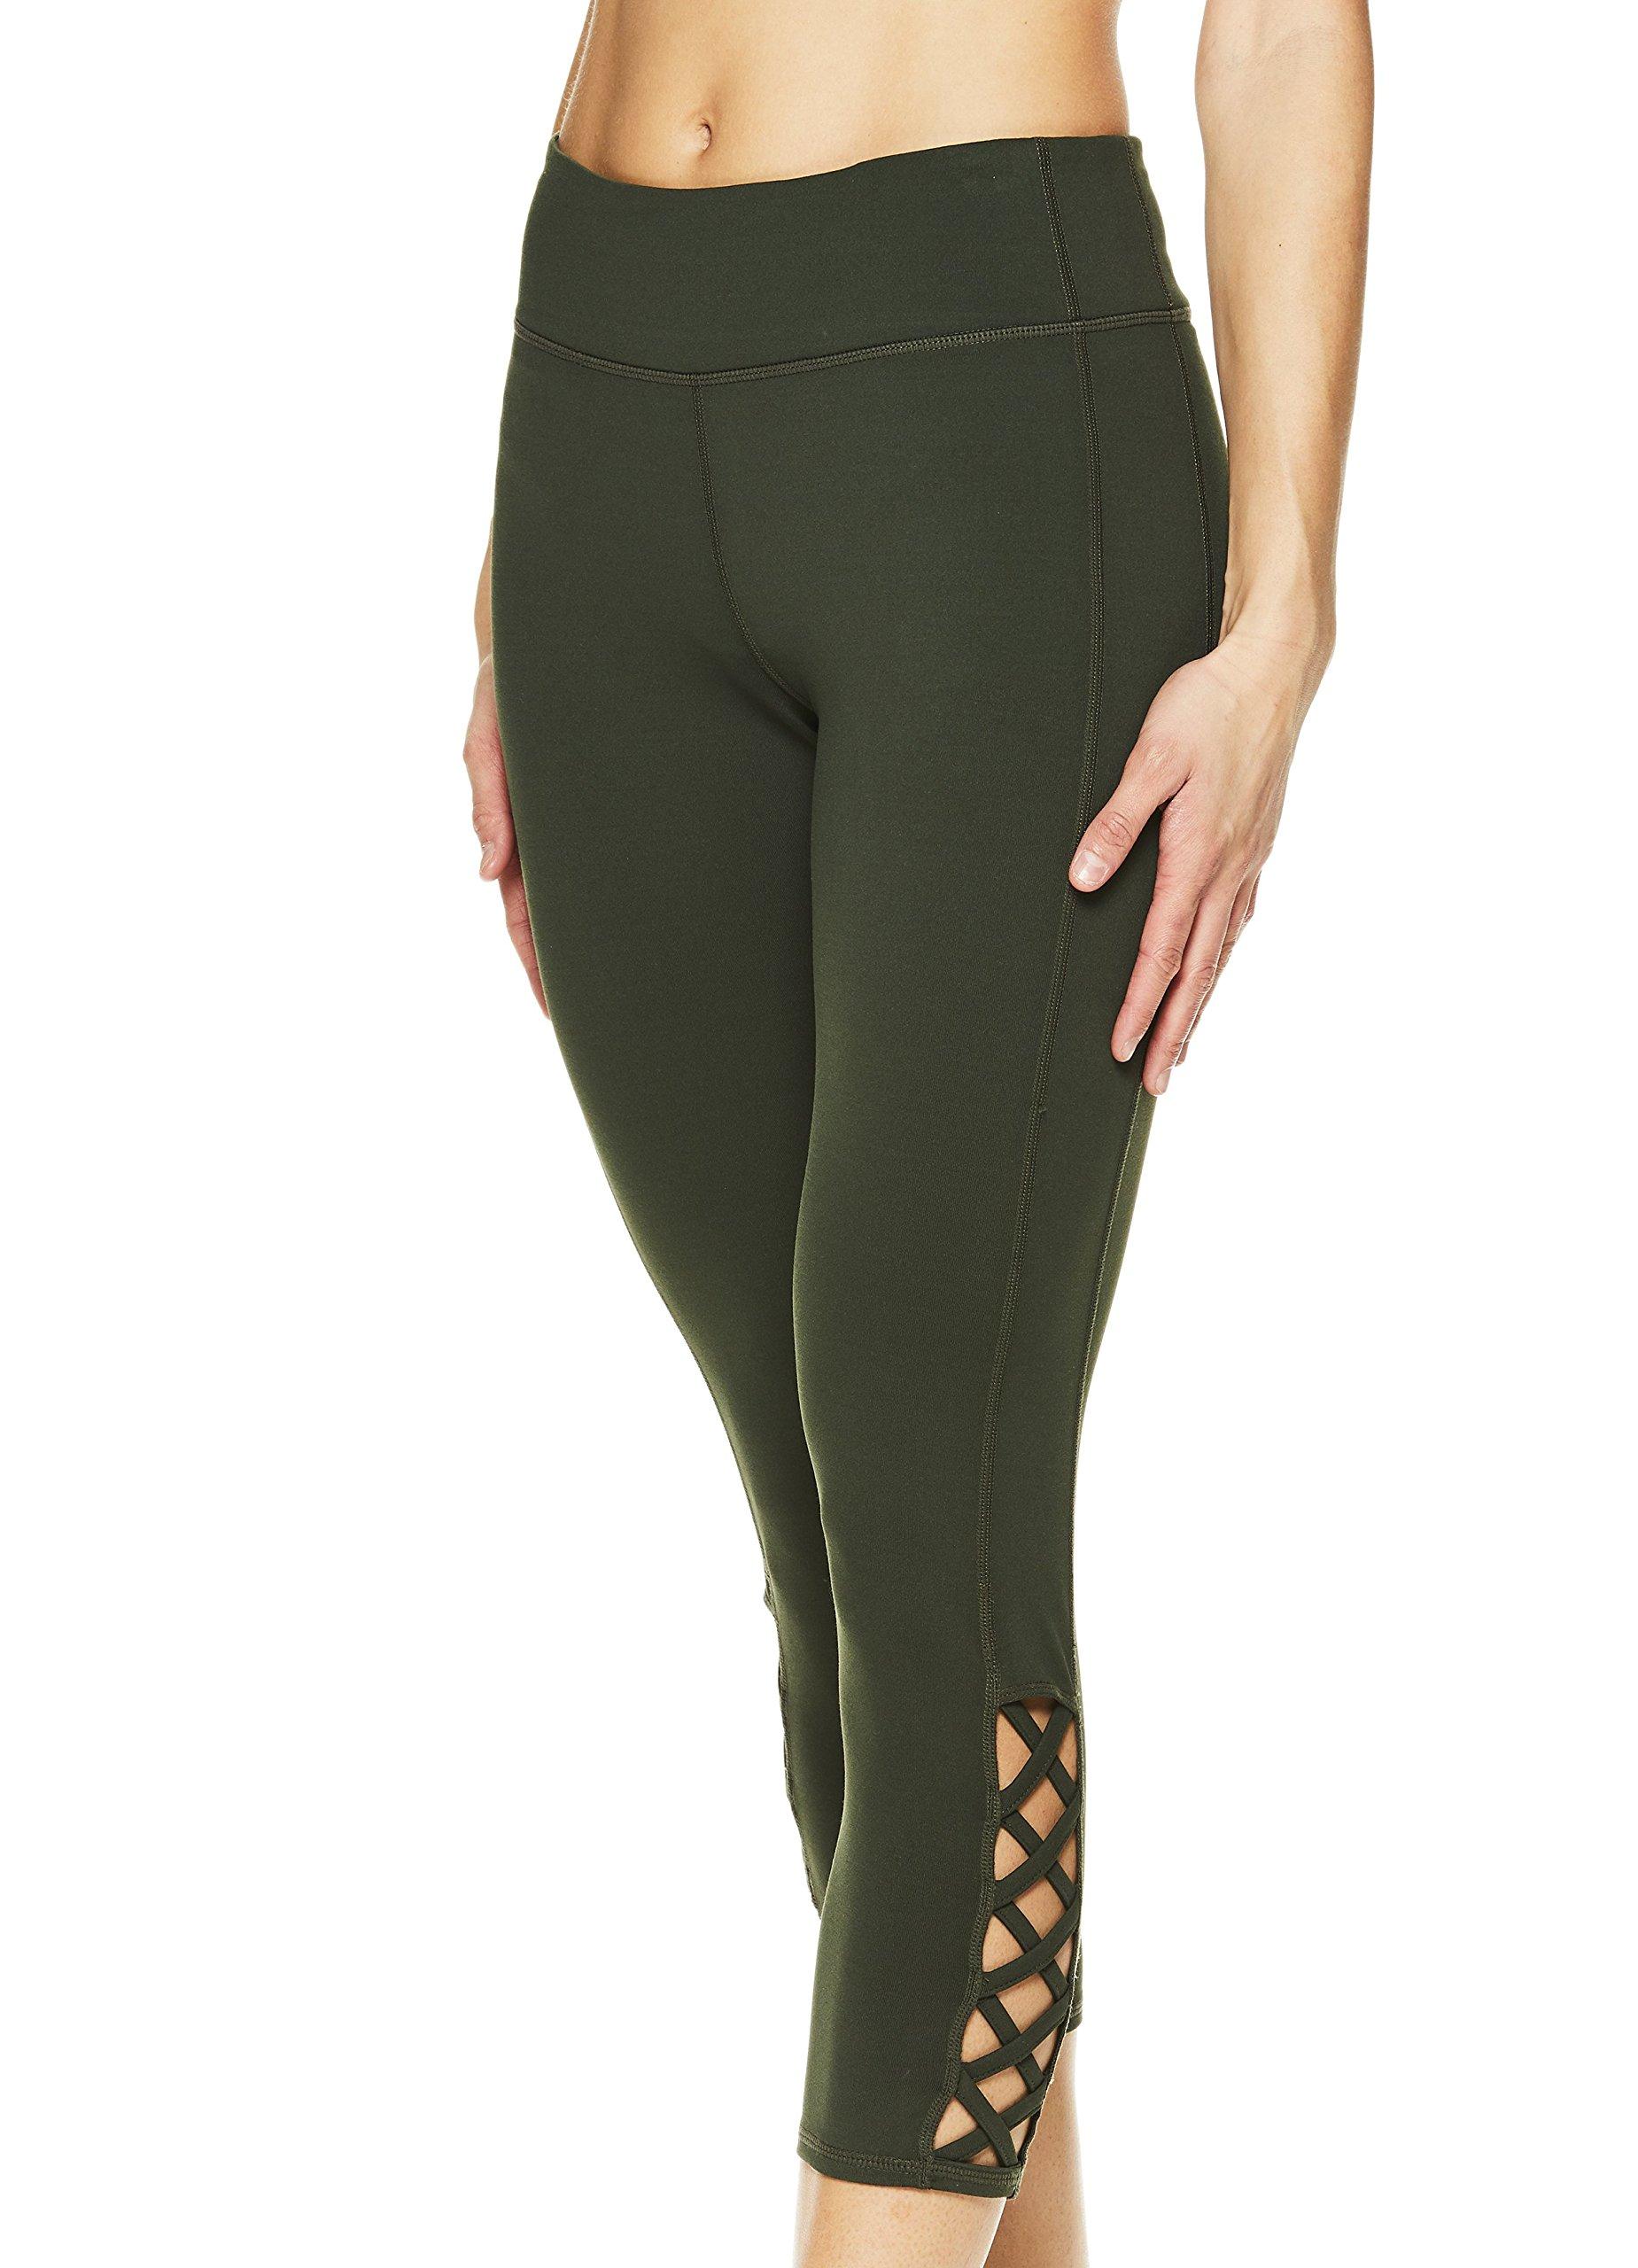 Gaiam Women's Capri Yoga Pants - Performance Spandex Compression Legging - Dufflebag, 3X by Gaiam (Image #5)